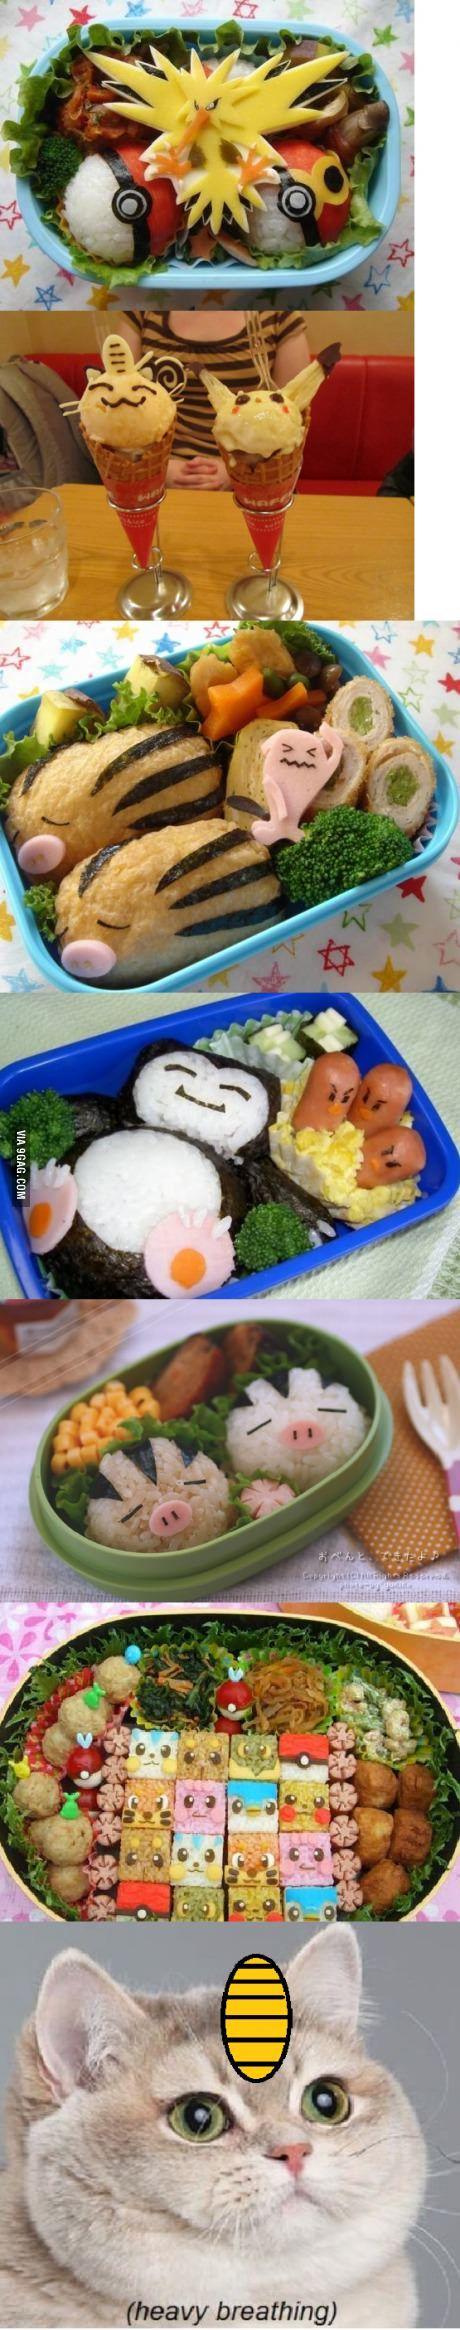 Awesome Pokemon food art